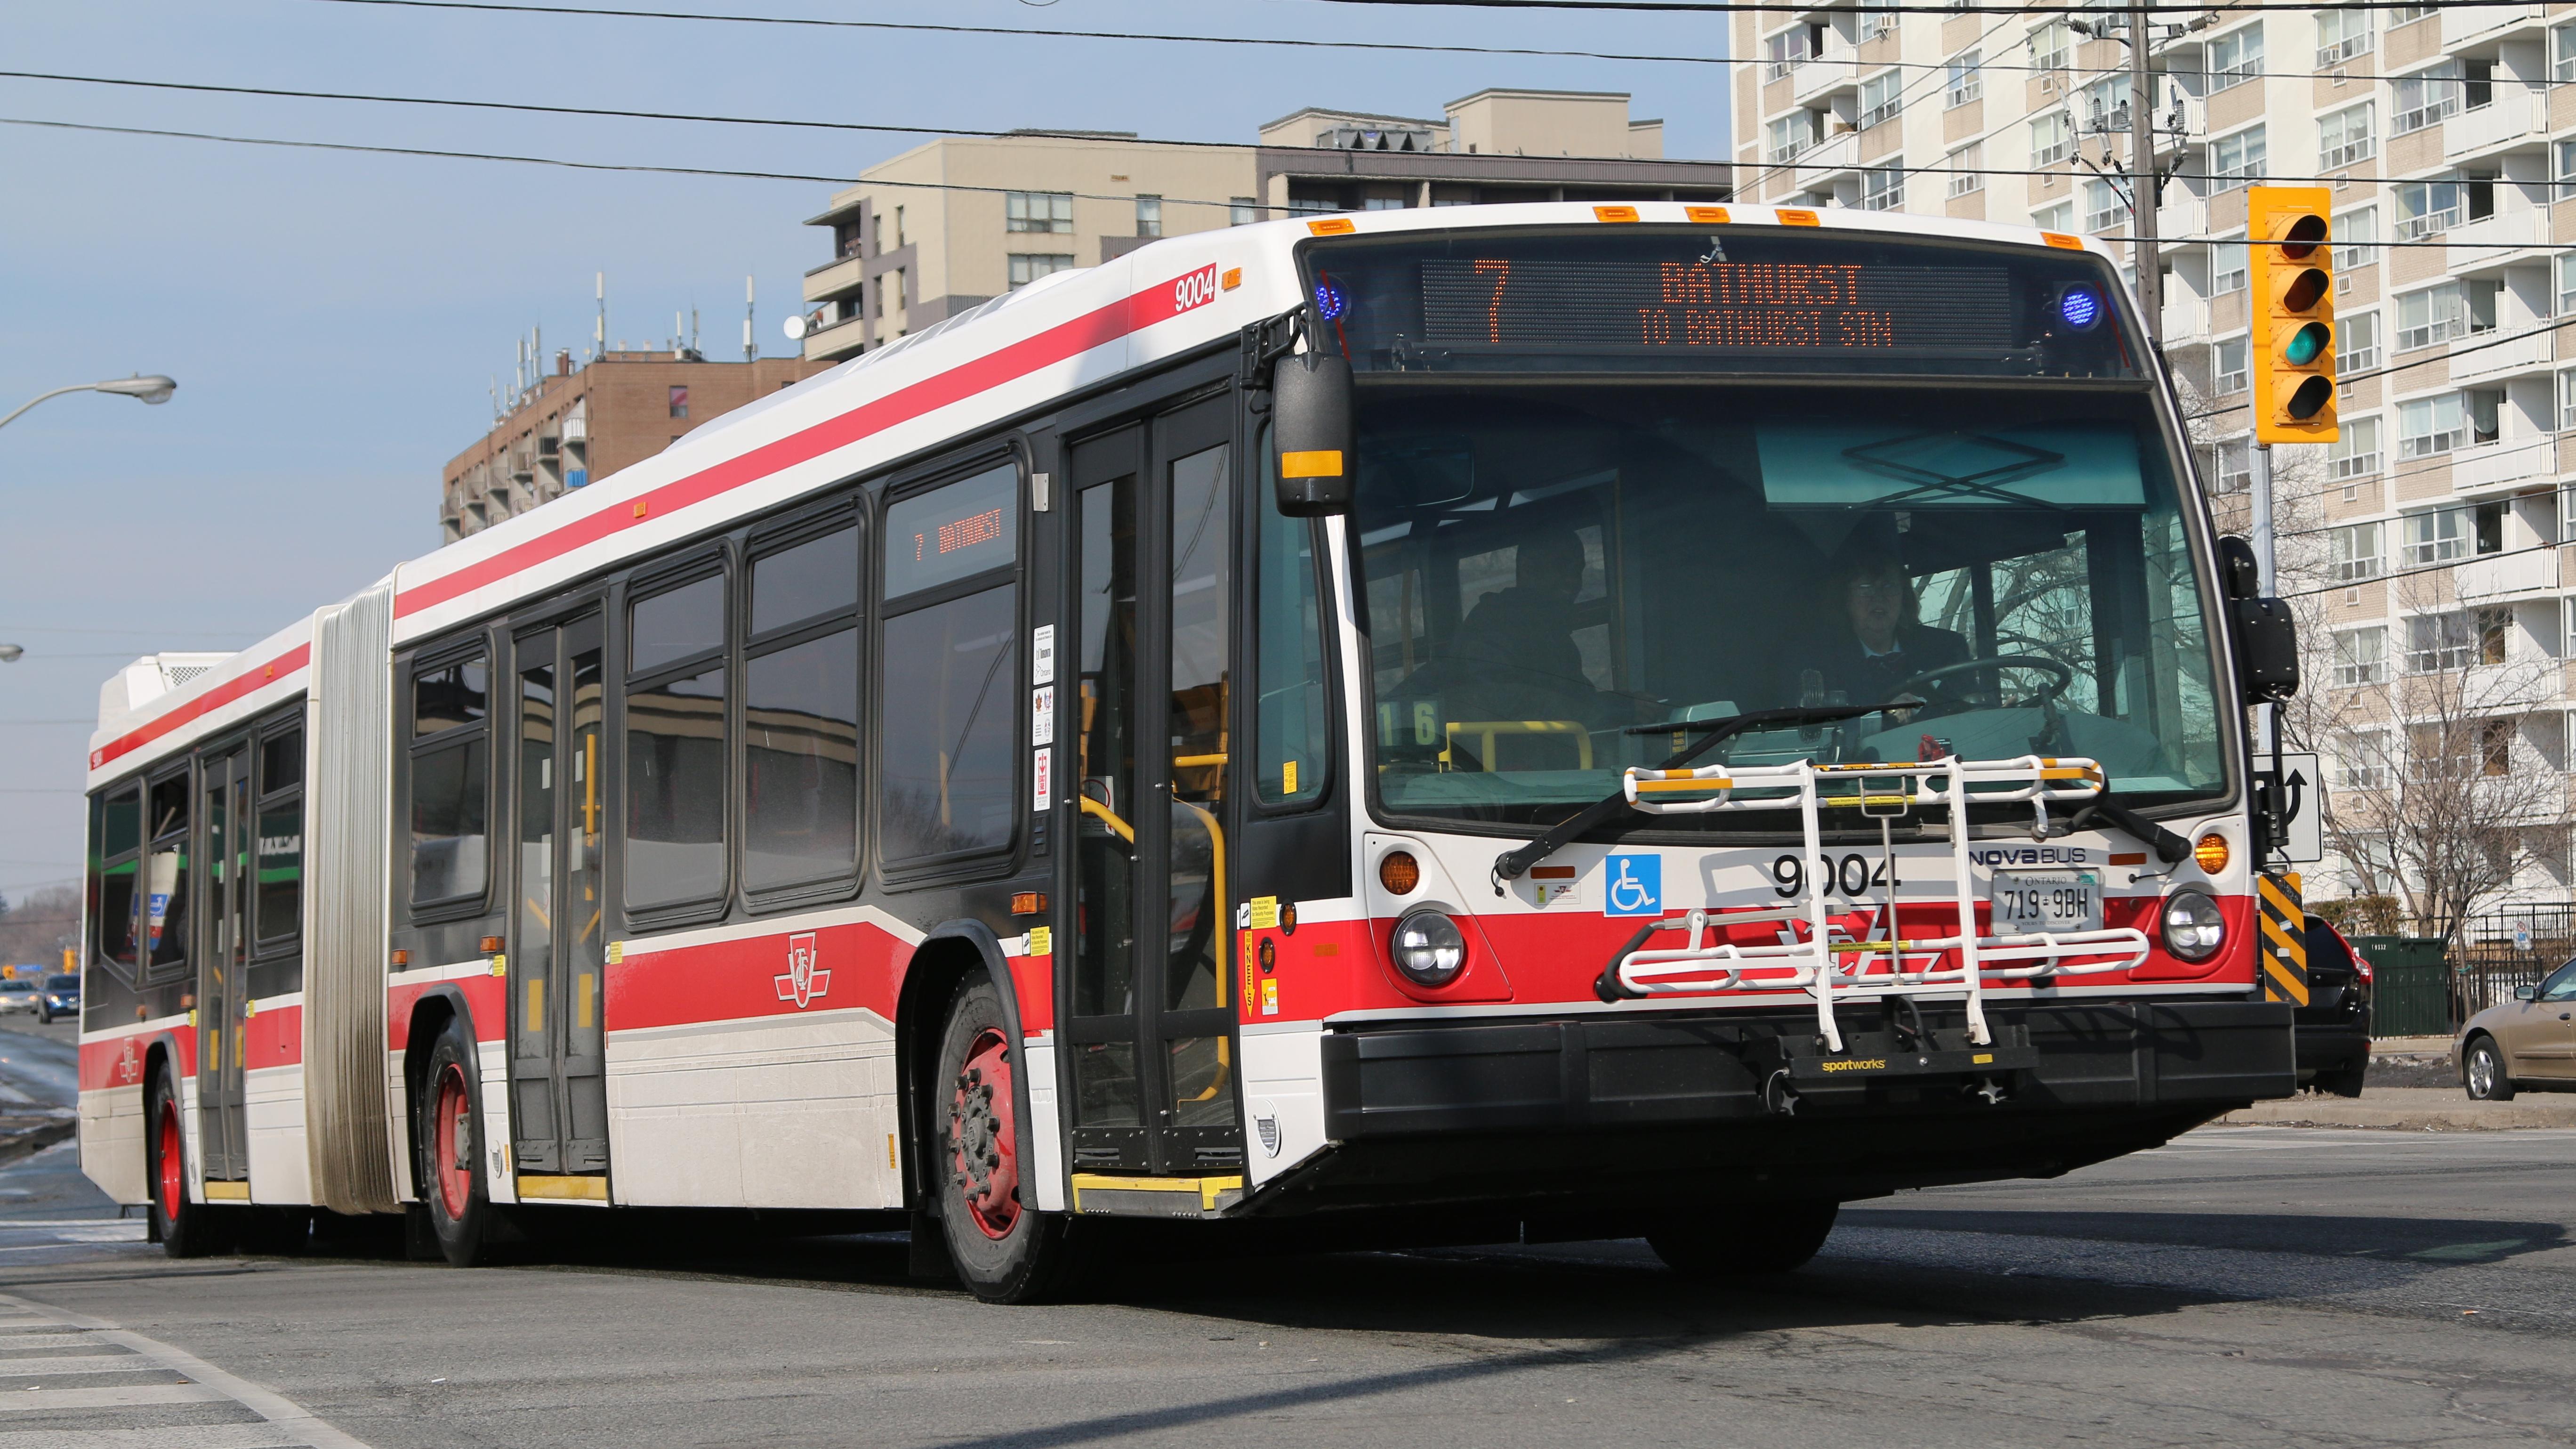 Transit highlights from my Toronto trip